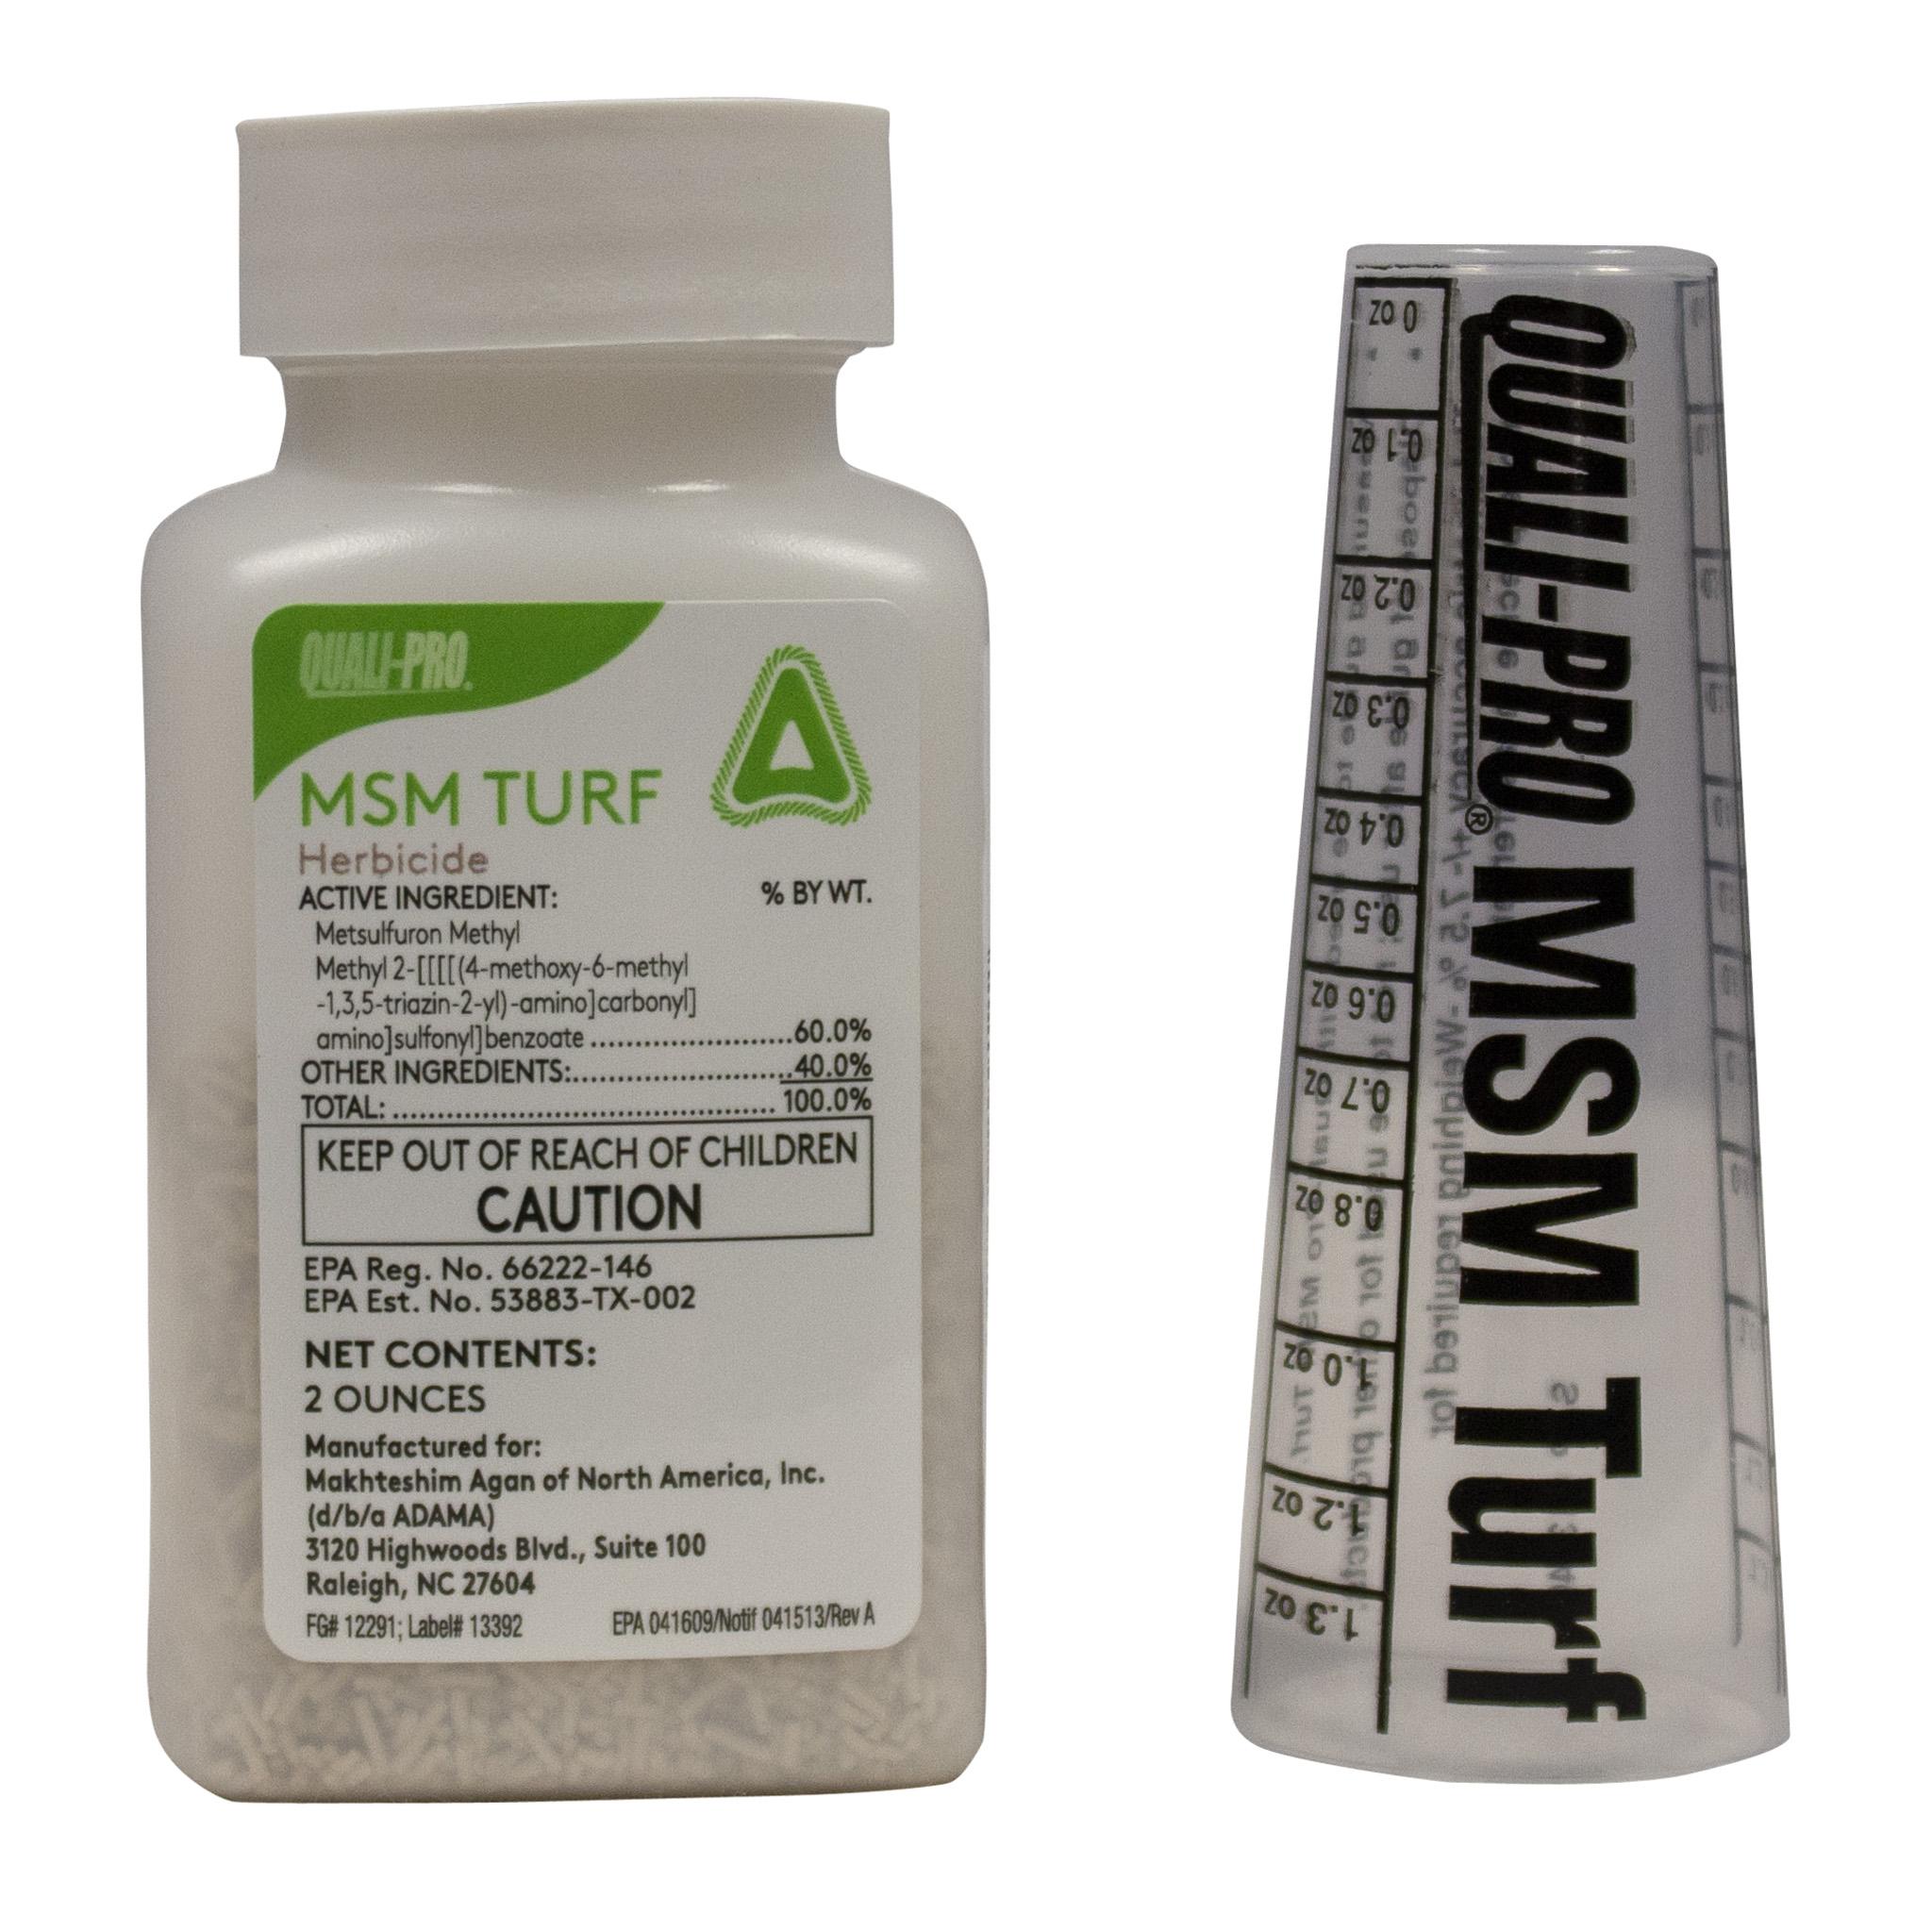 MSM Turf Herbicide